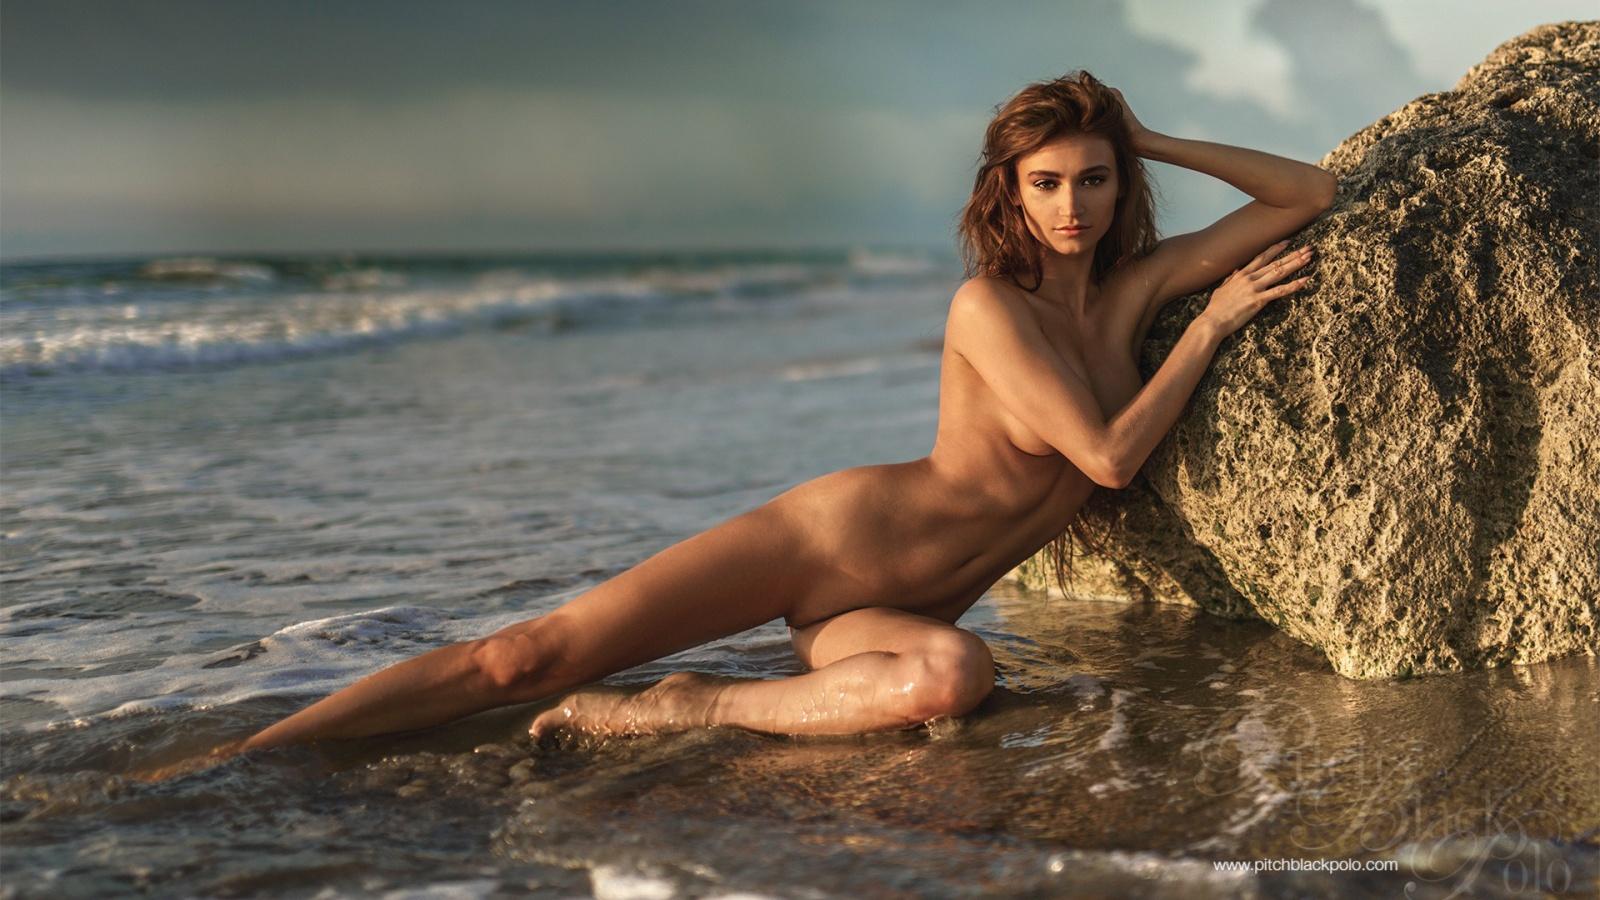 Ilvy Kokomo hot beauty naked by the sea 1600x900 nude models and ...